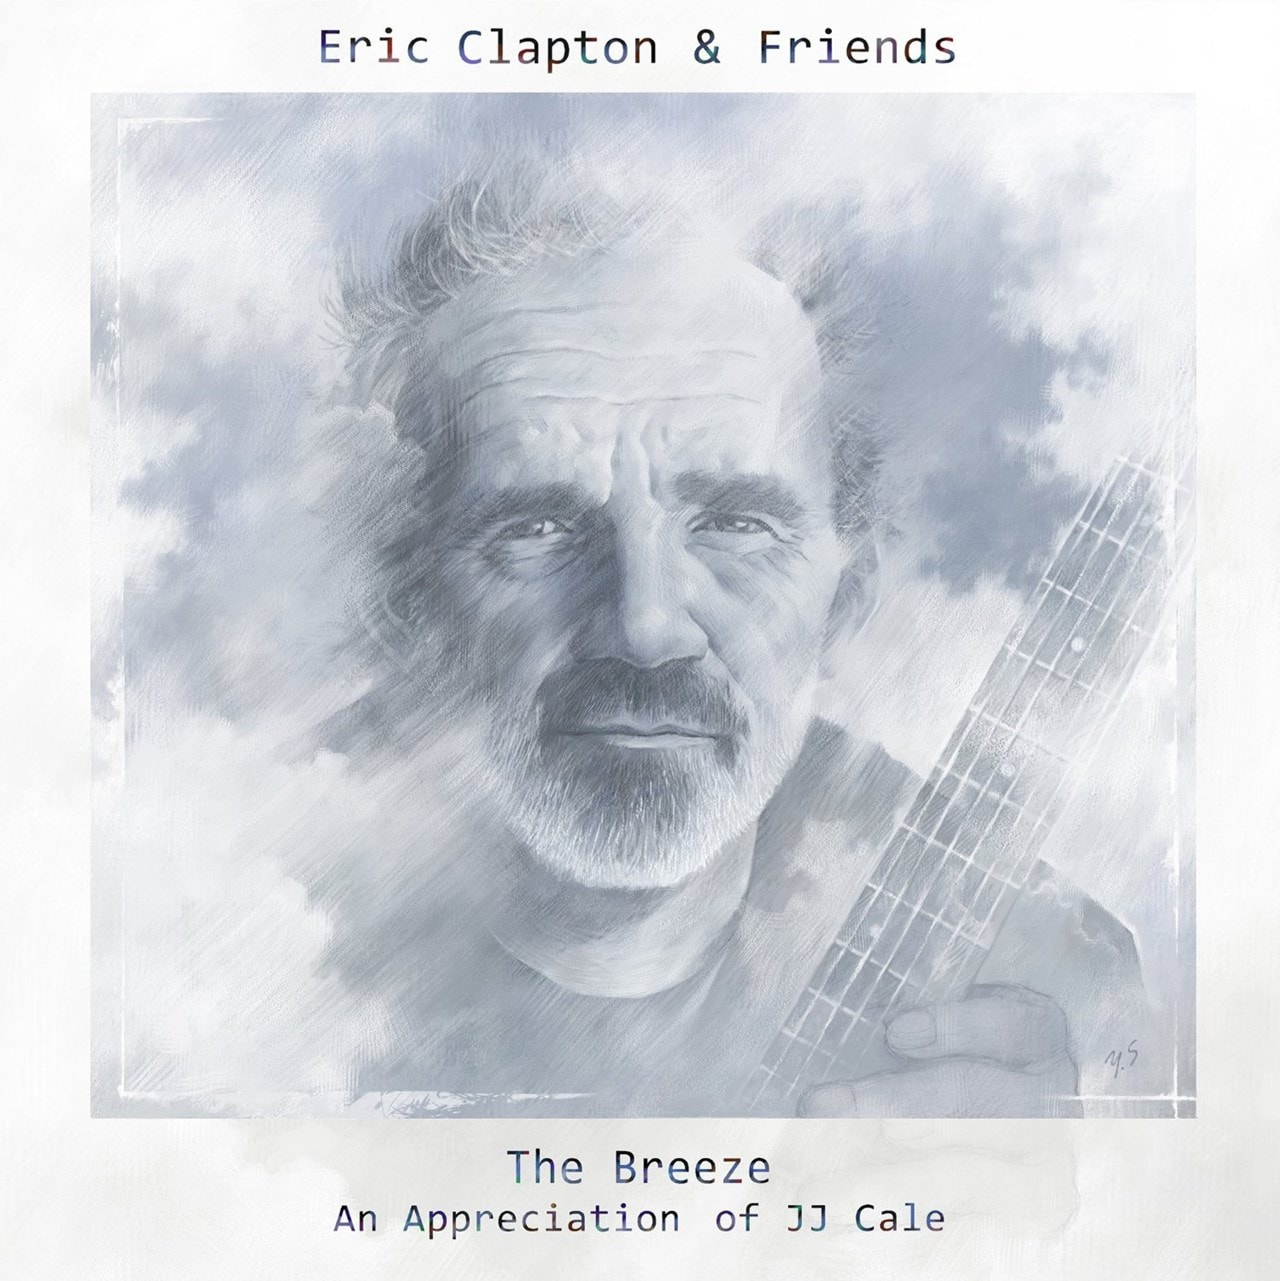 The Breeze: An Appreciation of J.J. Cale - 1